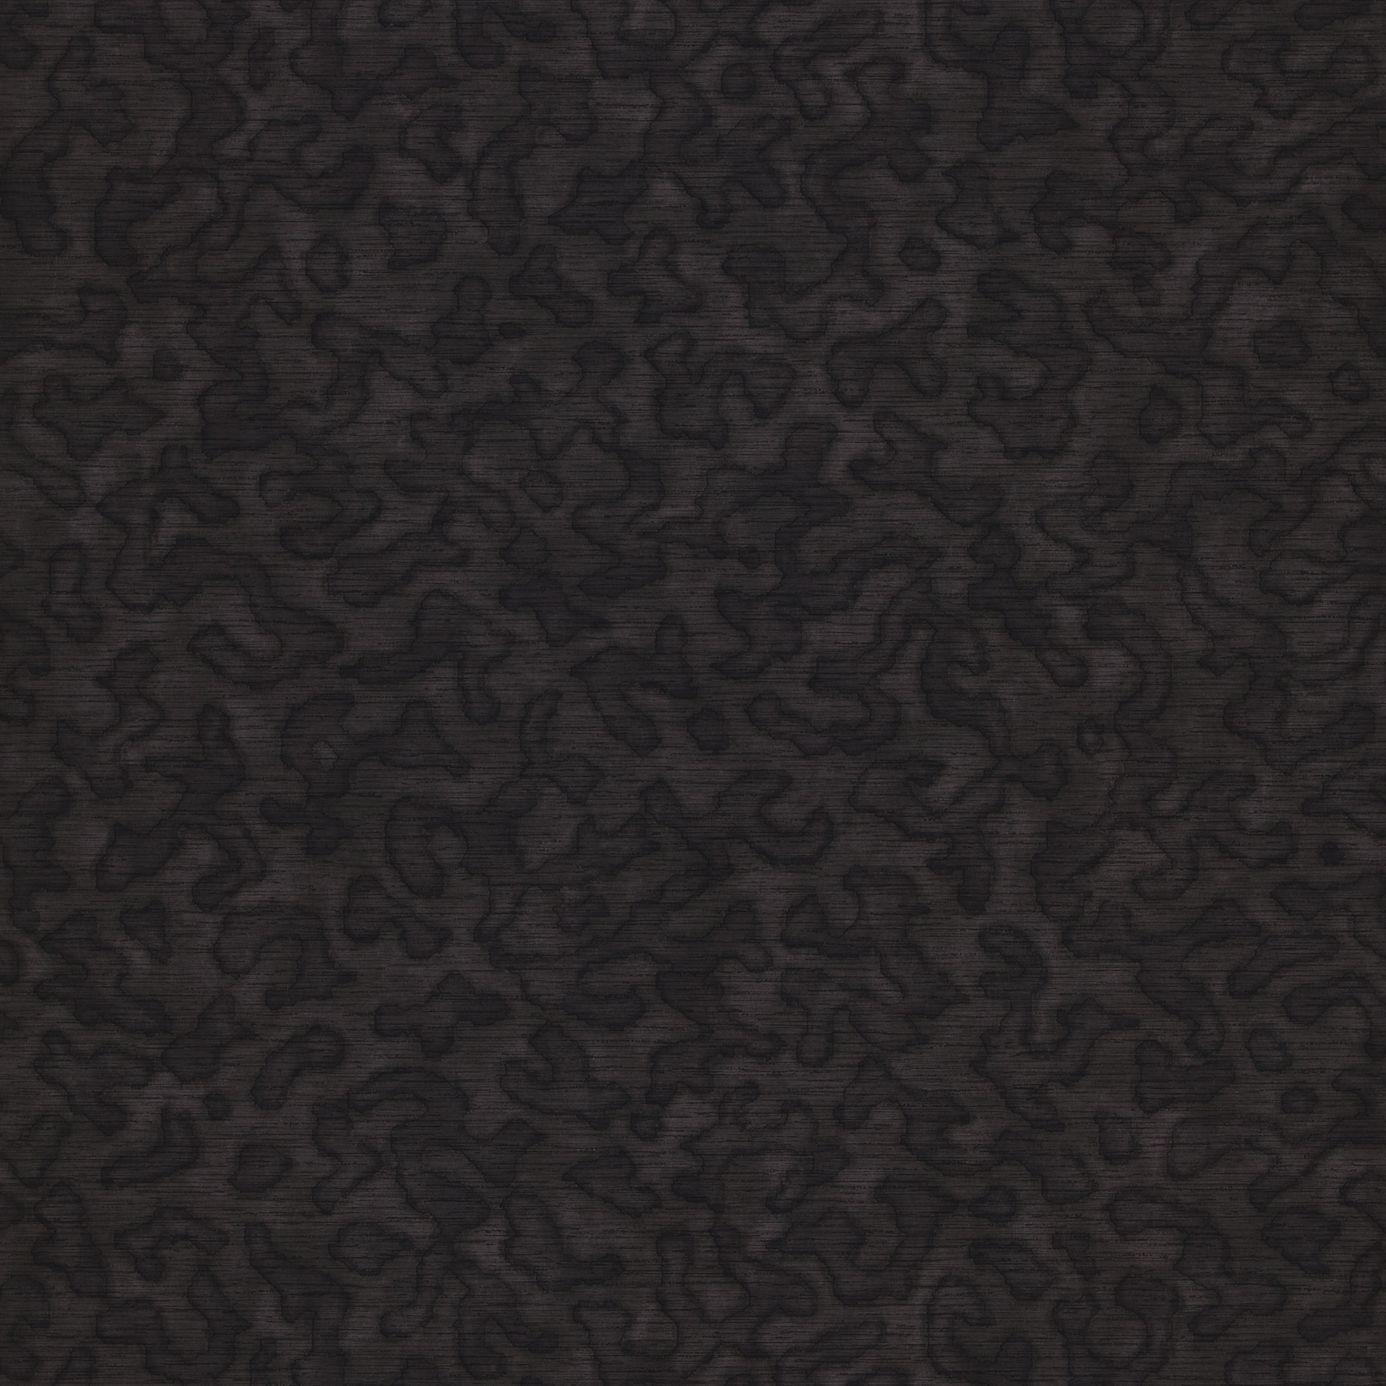 Home Wallpapers Harlequin Momentum Wallpapers Luxe Wallpaper 1386x1386